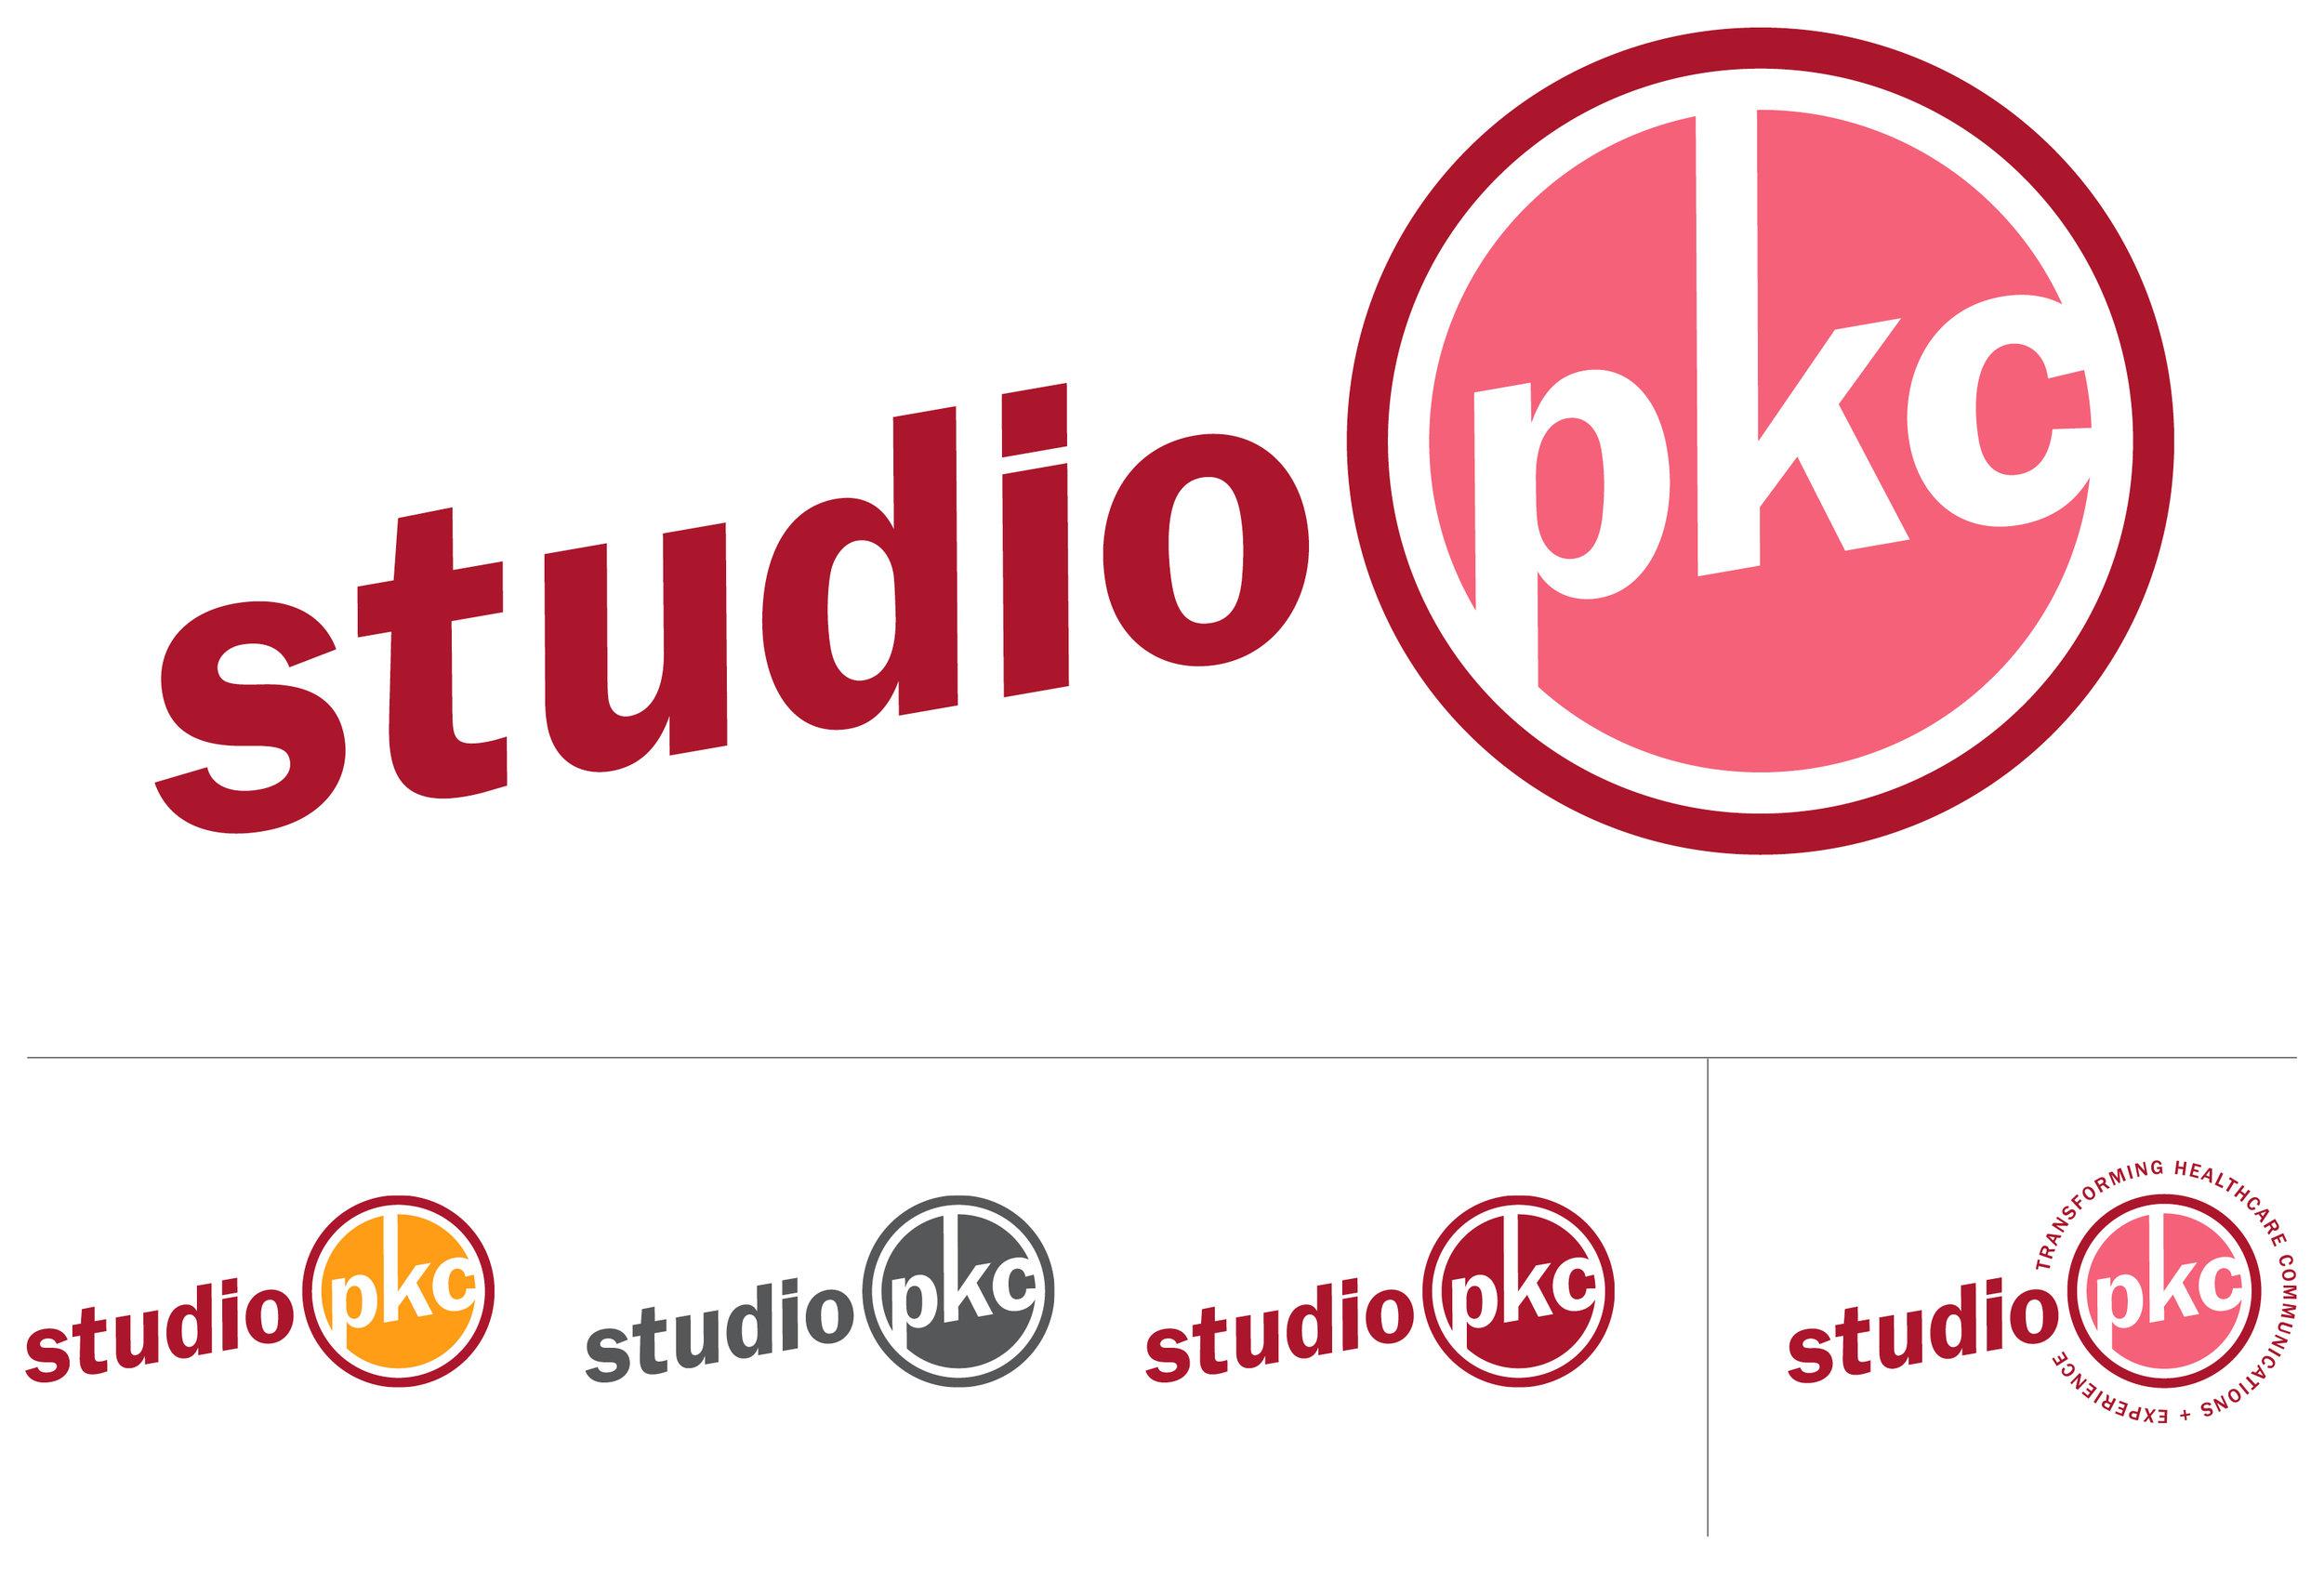 studio pkc